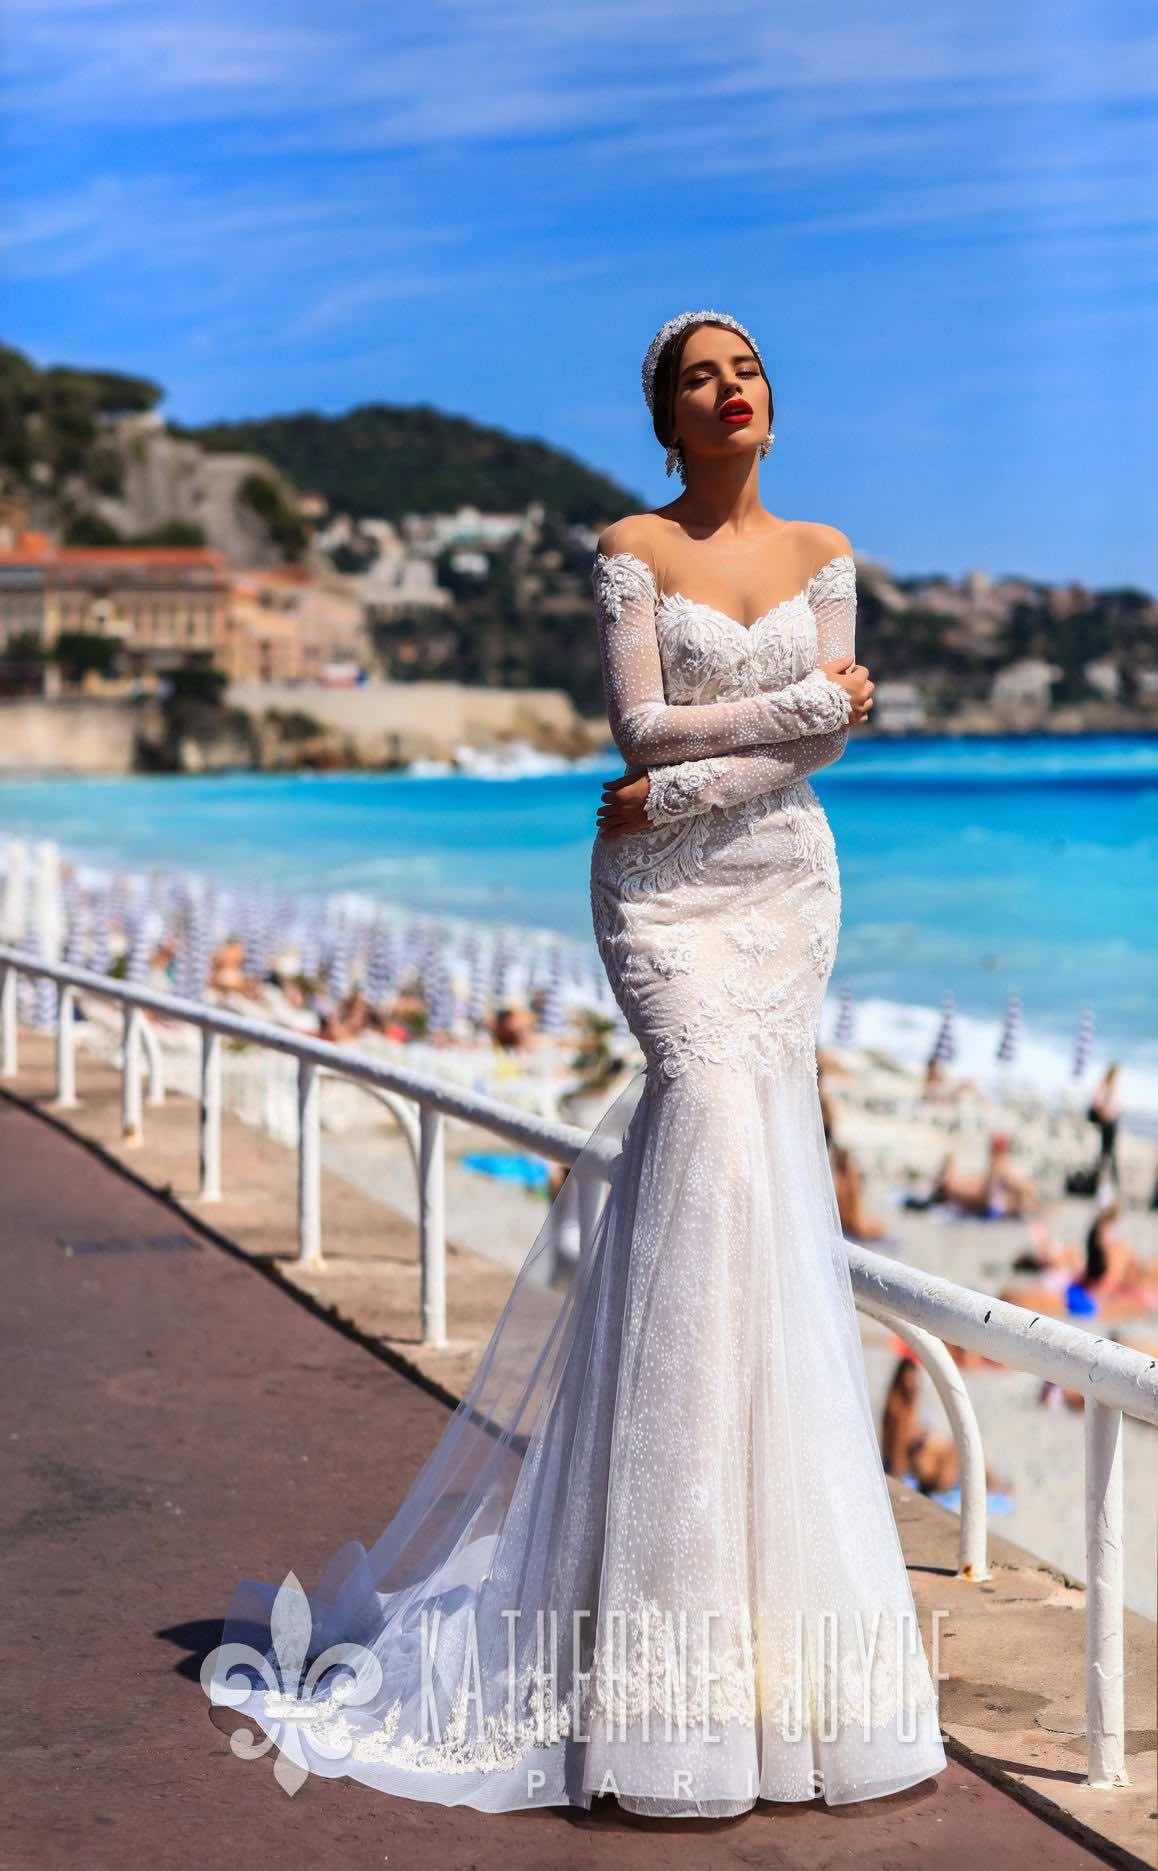 Romantic Katherine Joyce Wedding Dresses With Modern Elegance Modwedding Wedding Dresses Romantic Bridal Gowns Lace Mermaid Wedding Dress [ 1871 x 1158 Pixel ]